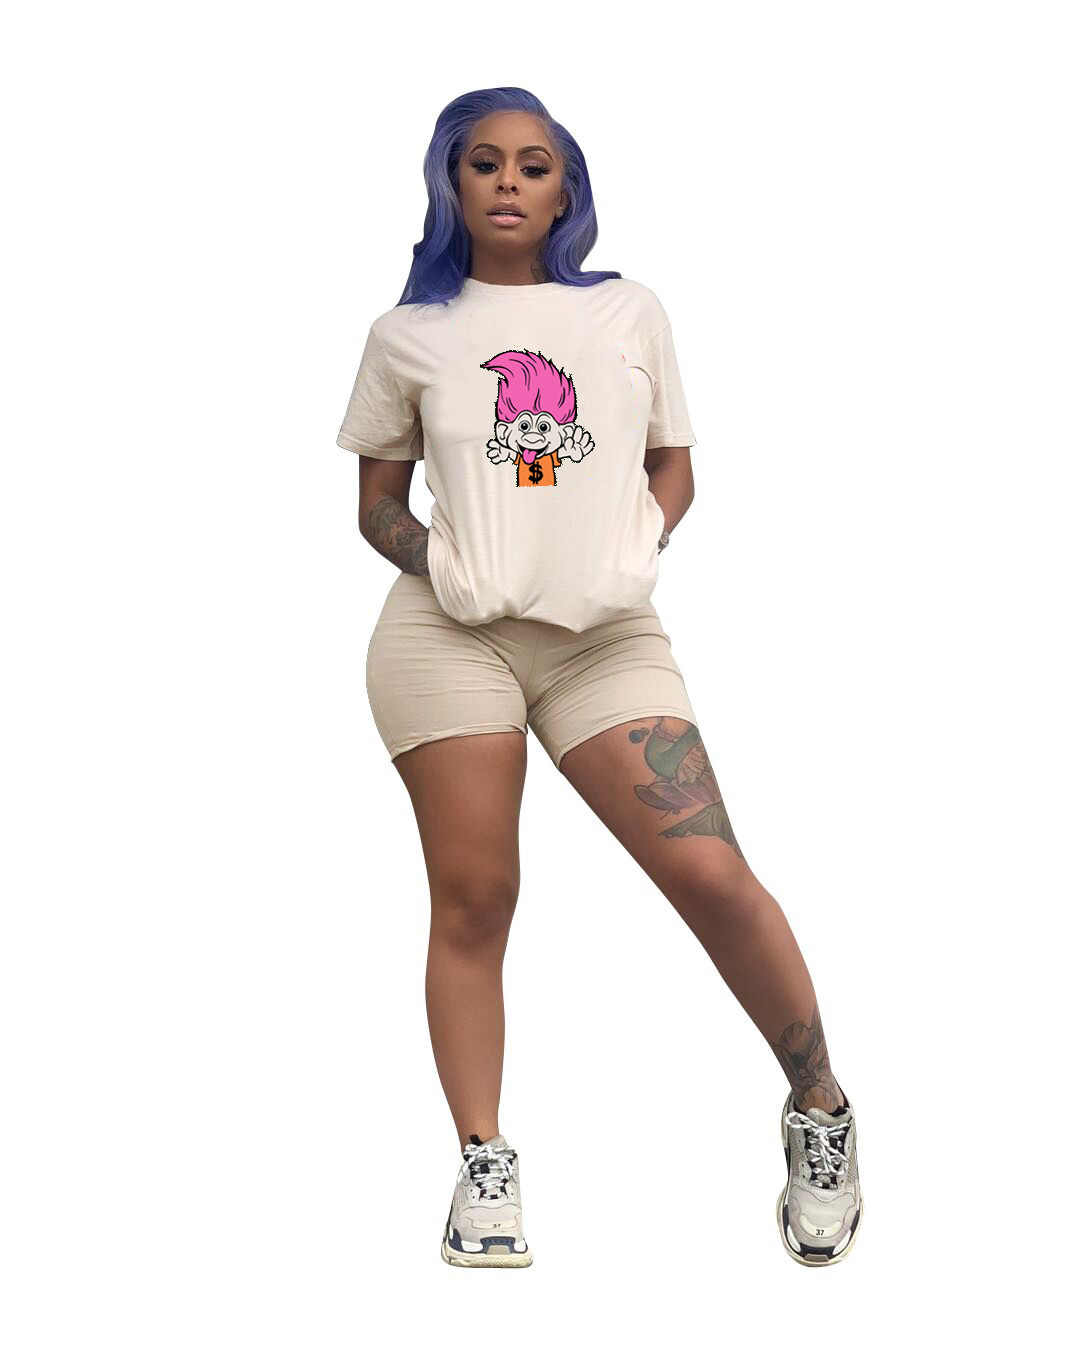 2019 Wanita Musim Panas Kartun Cetak Leher O Lengan Pendek Tee Top & Celana Pendek Suit Dua Sepotong Set Fashion Aktif Memakai Pakaian Latihan Yg Hangat DN8231